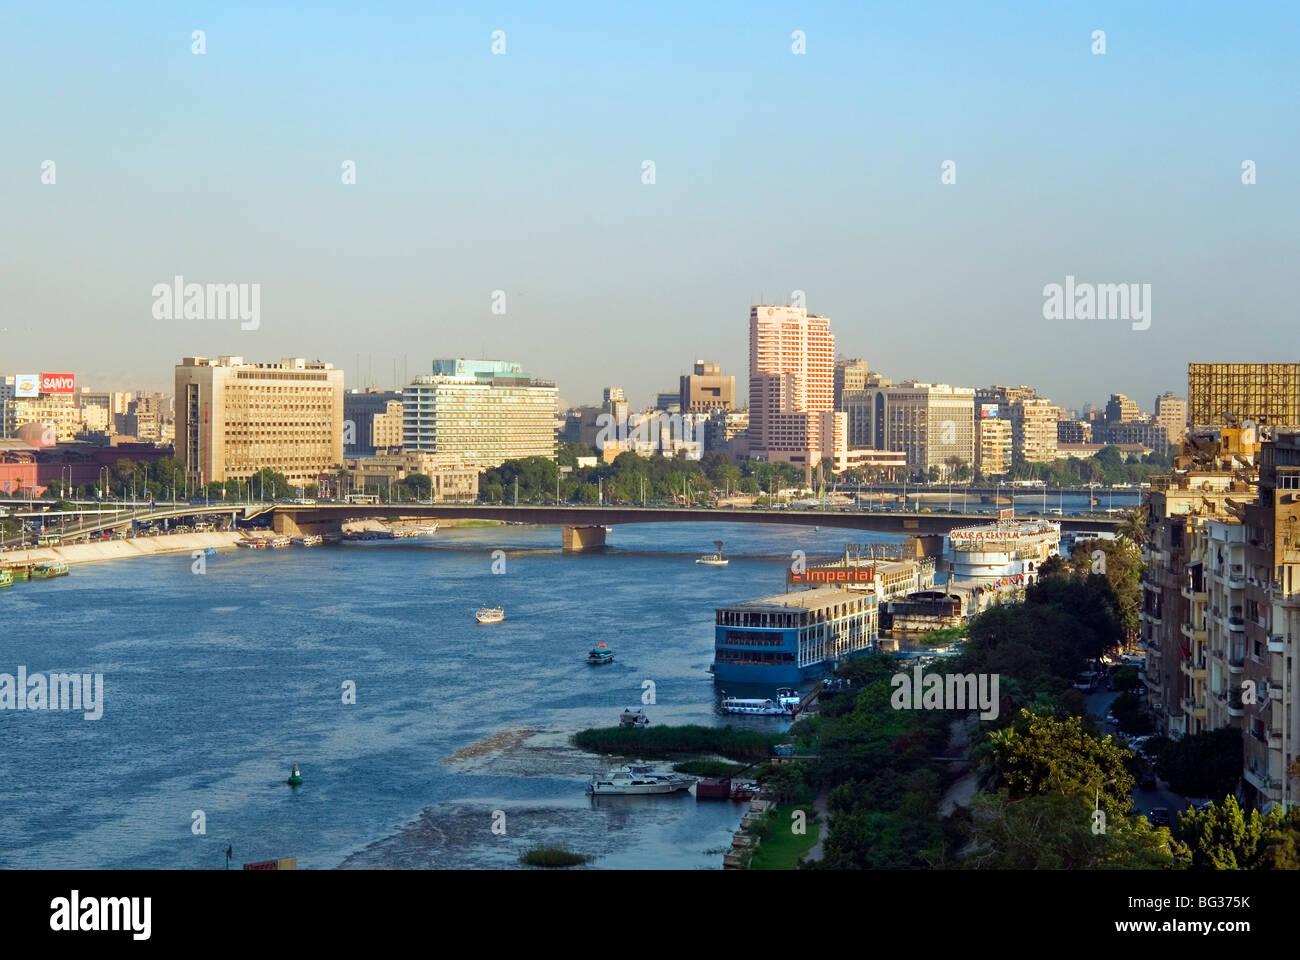 Corniche El Nil, Nil, Kairo, Ägypten, Nordafrika, Afrika Stockbild